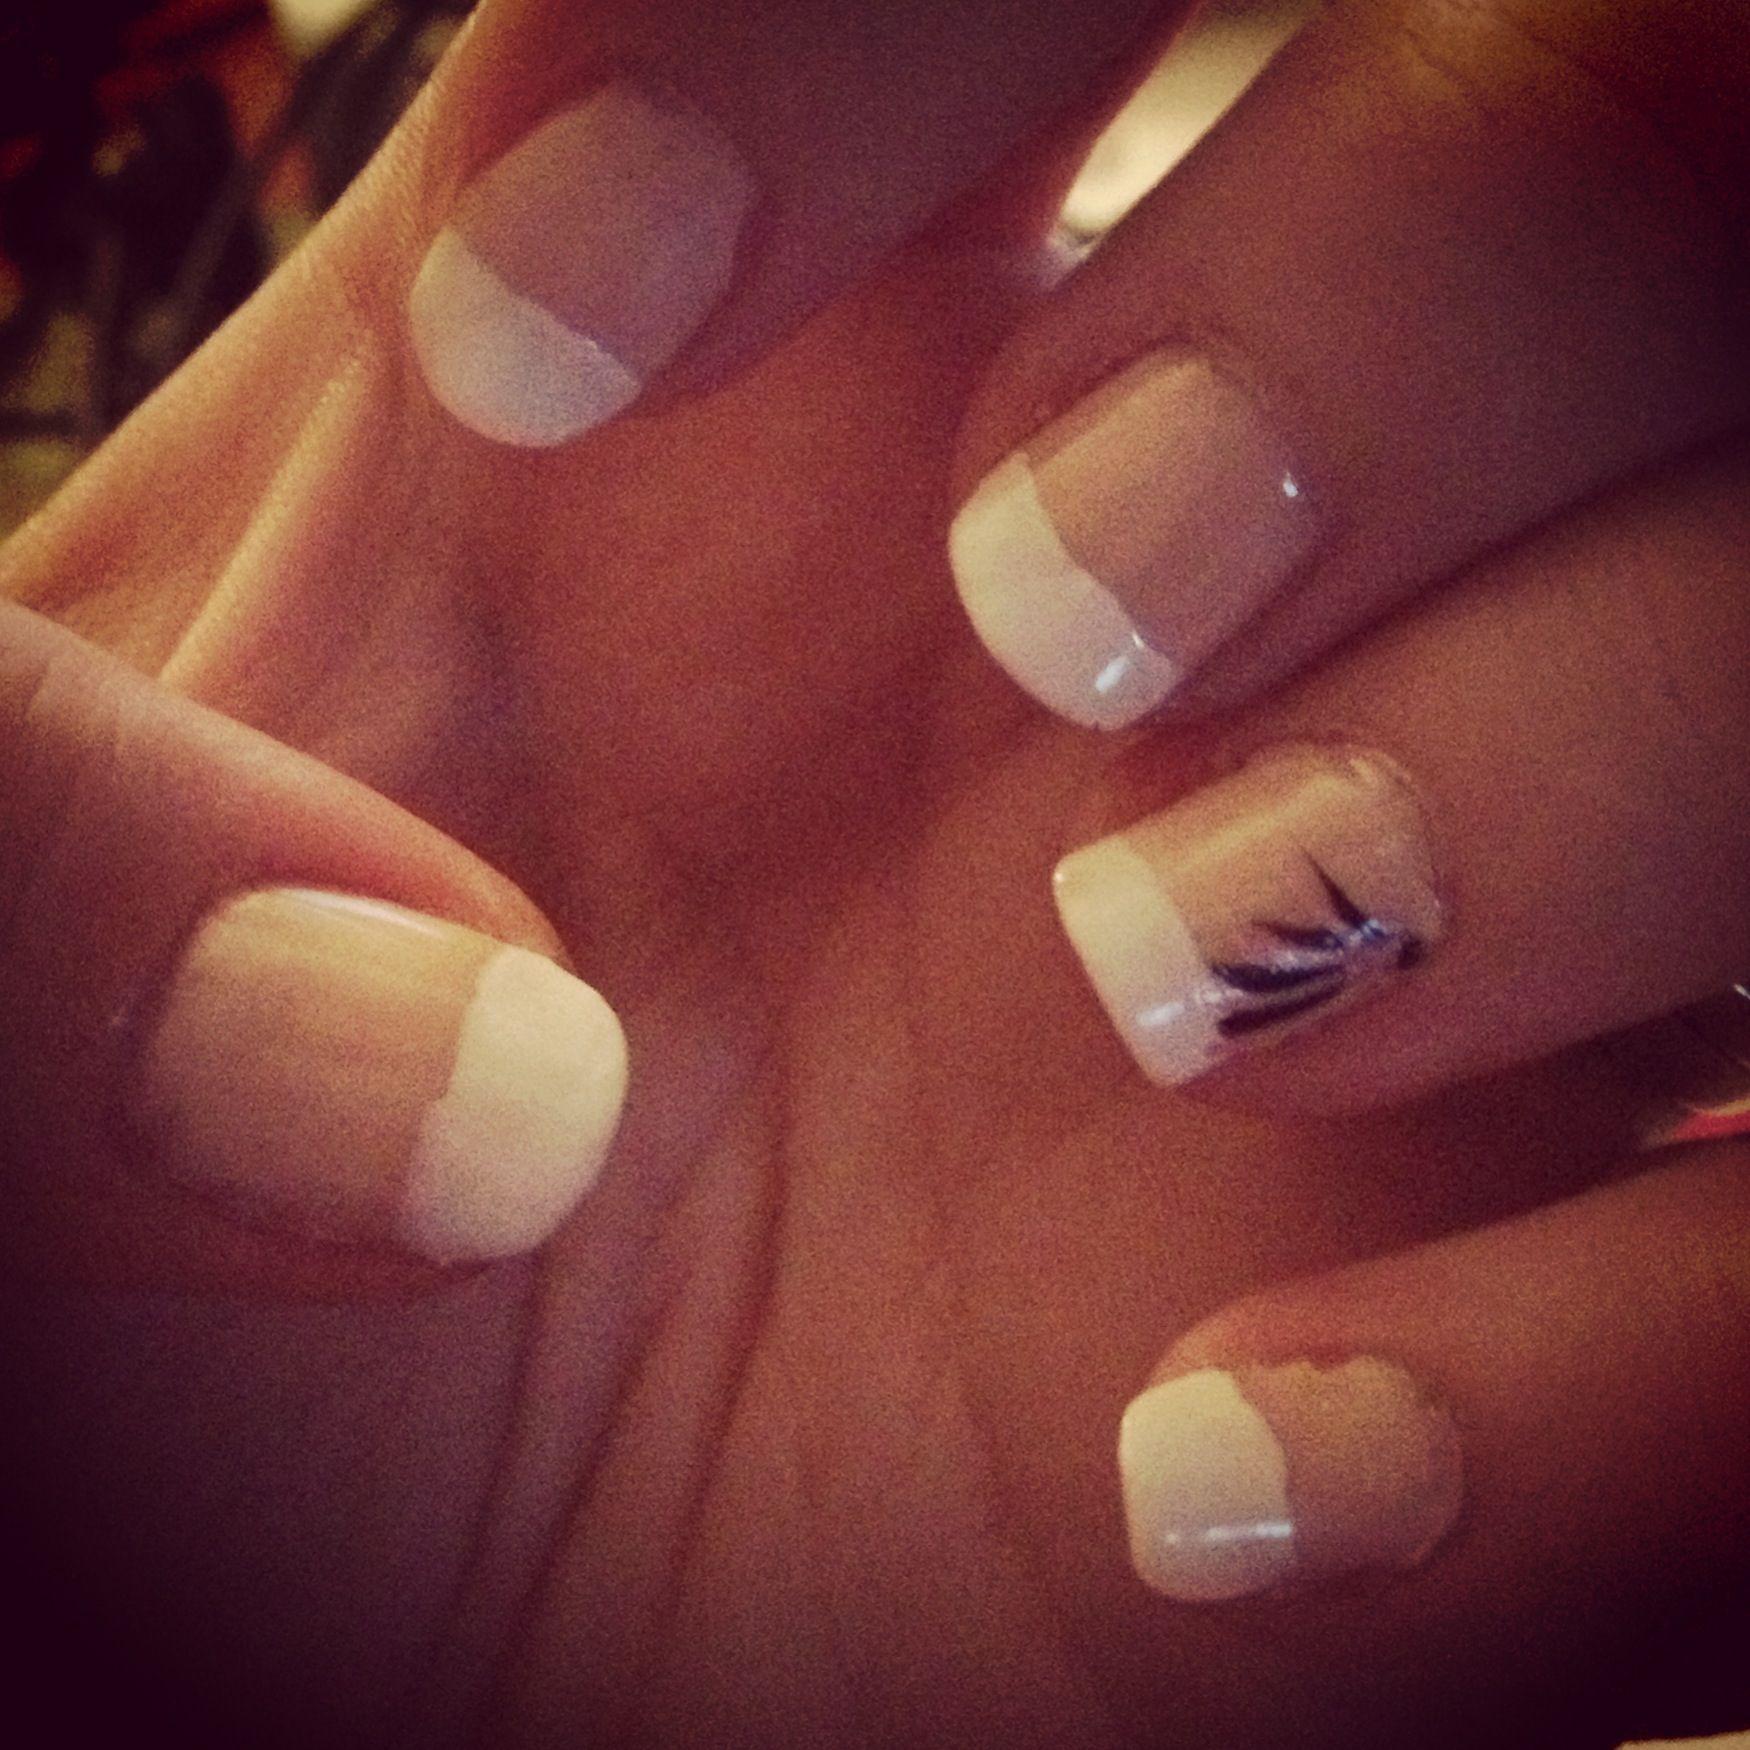 Single Ring Finger Design Easy Nails Nail